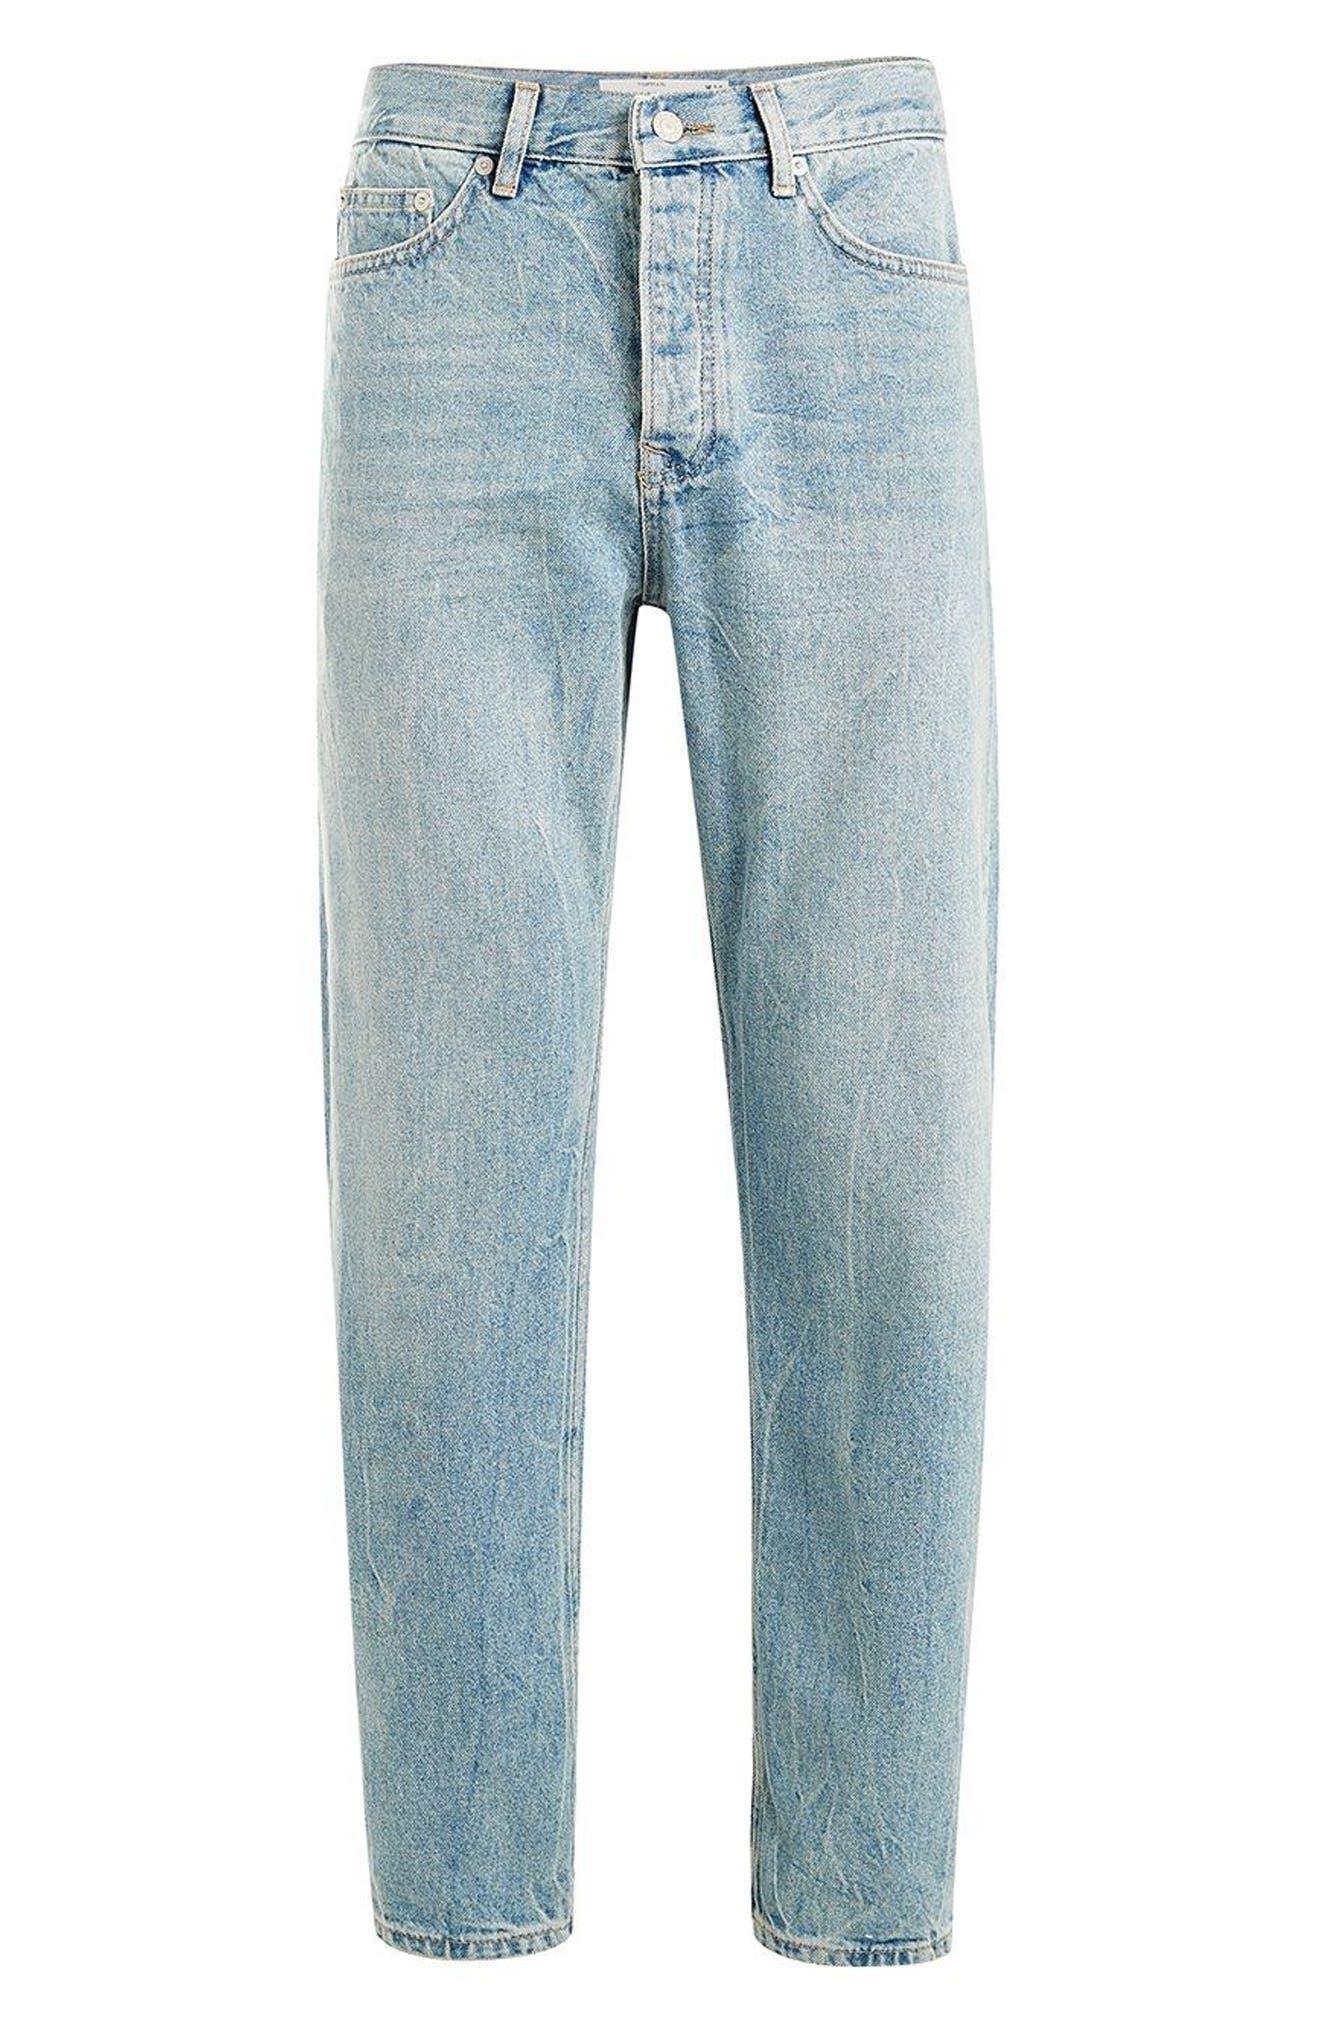 Original Fit Straight Leg Jeans,                             Alternate thumbnail 3, color,                             400